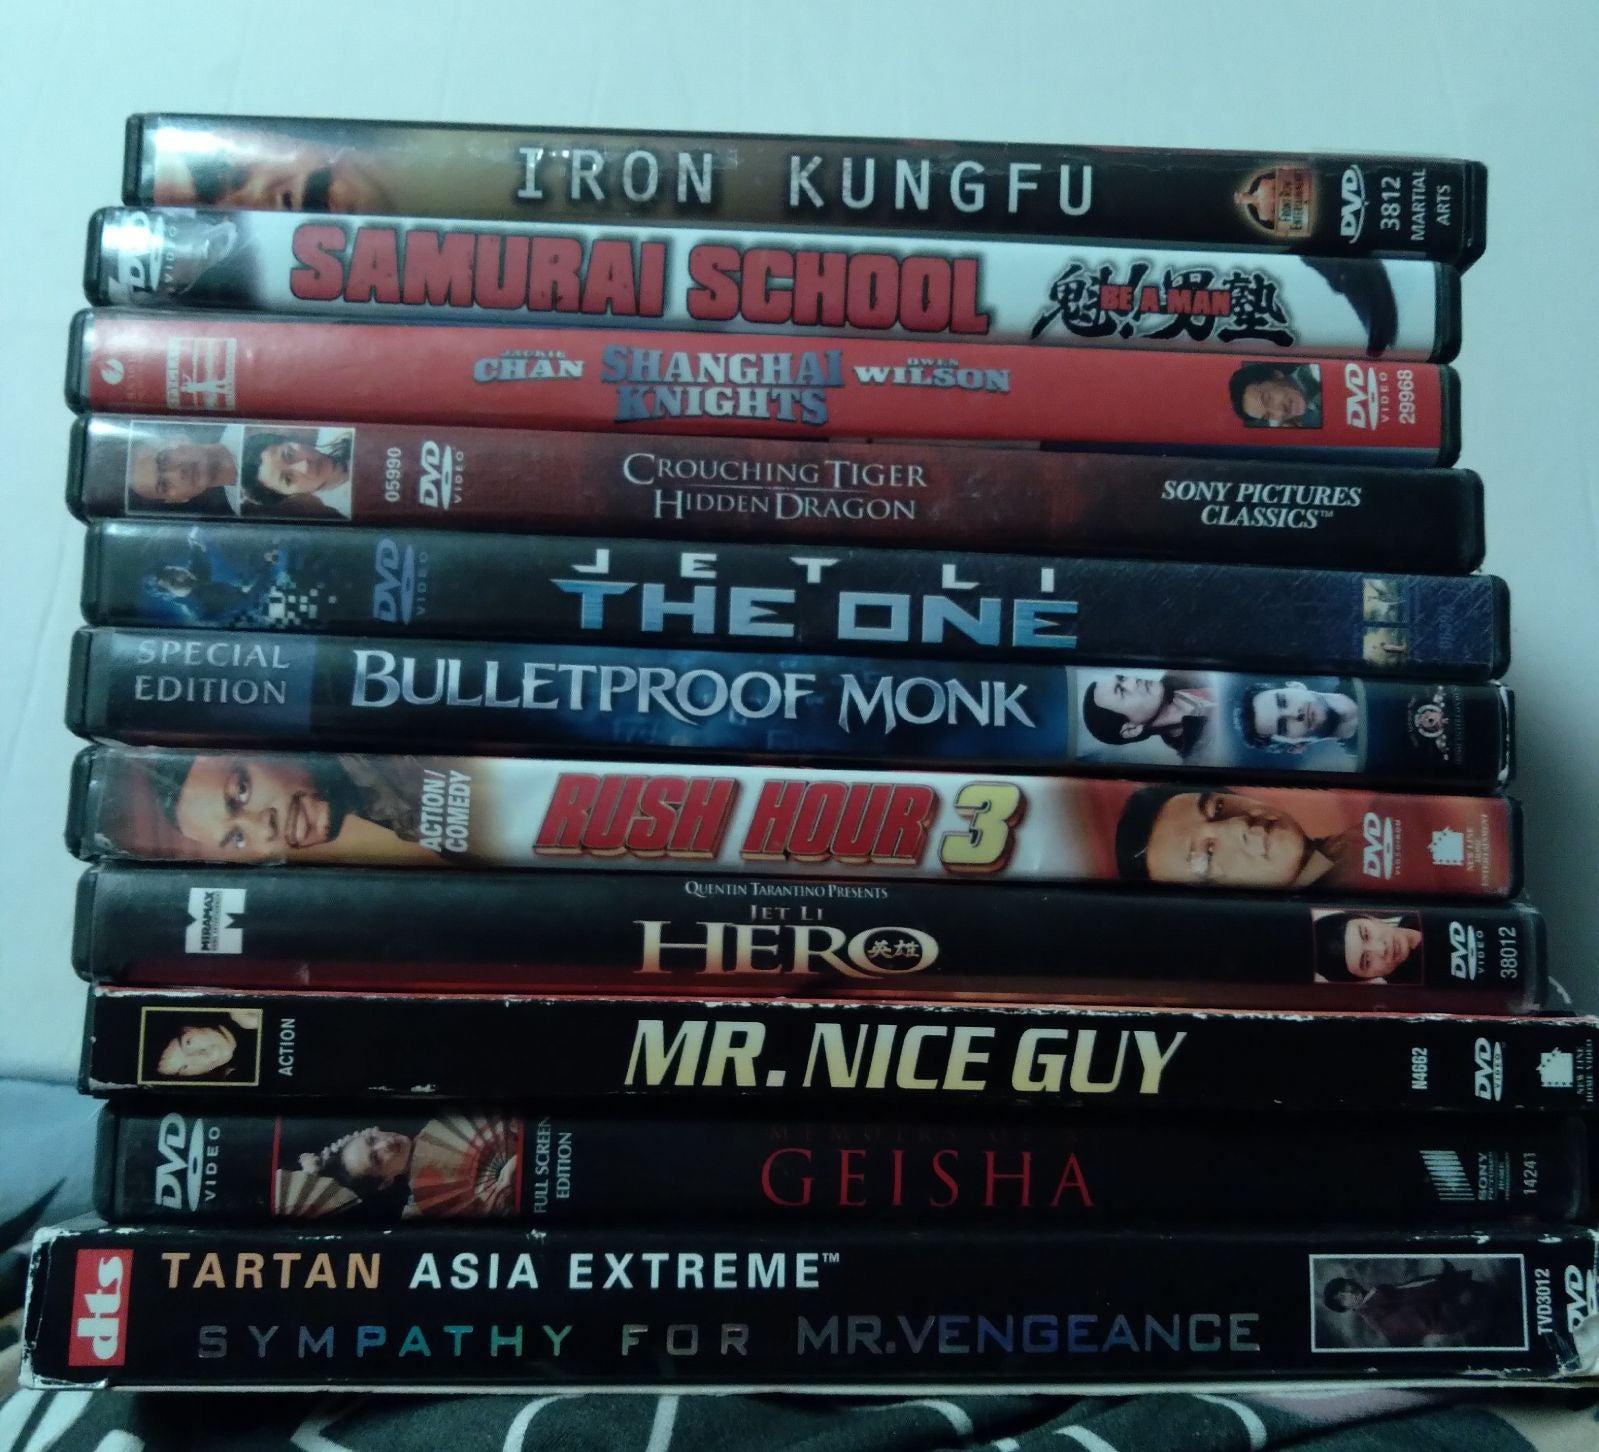 Jackie Chan, Jet Li, and more